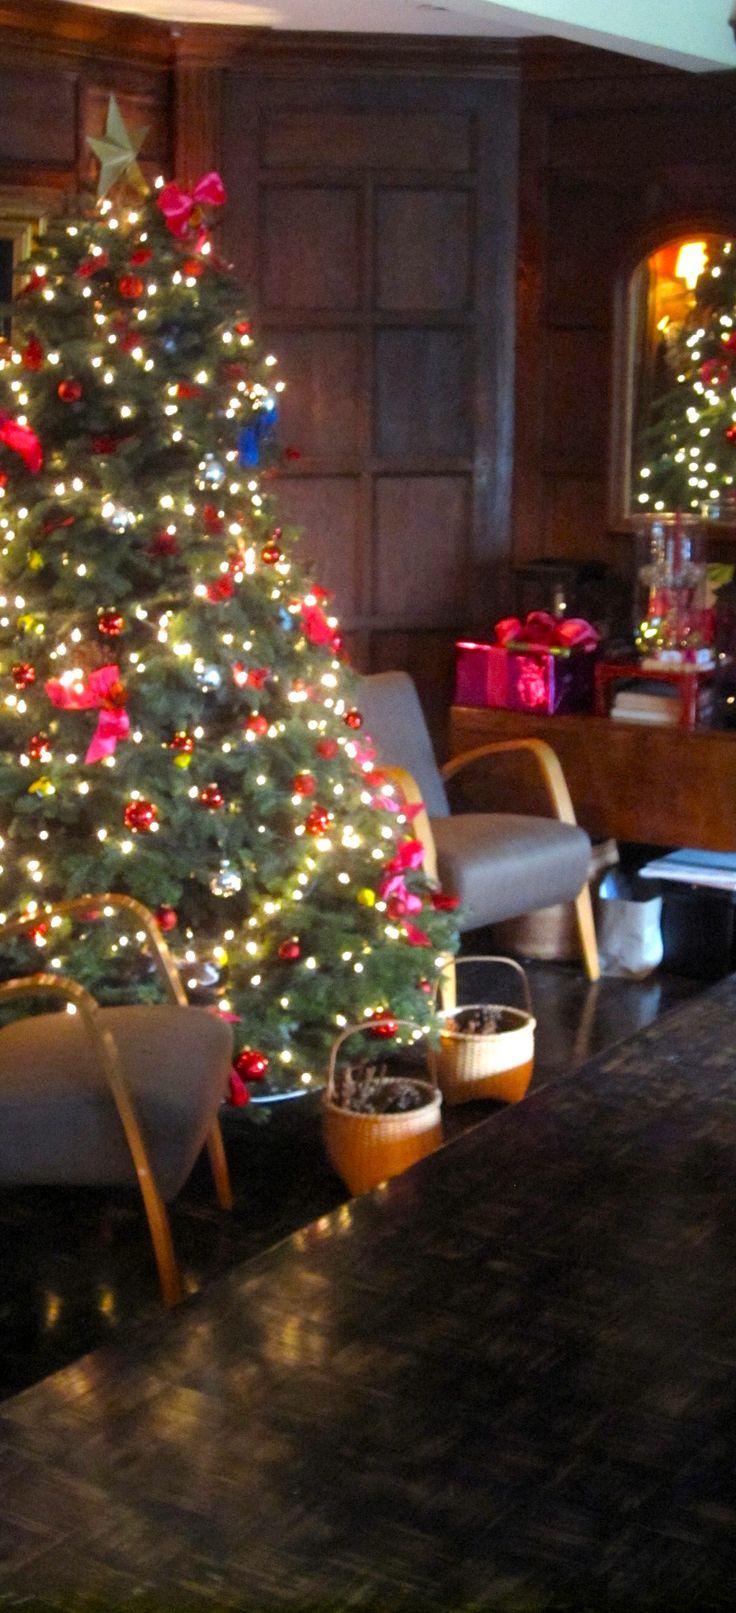 Christmas at Designer Joe Ruggiero's home.